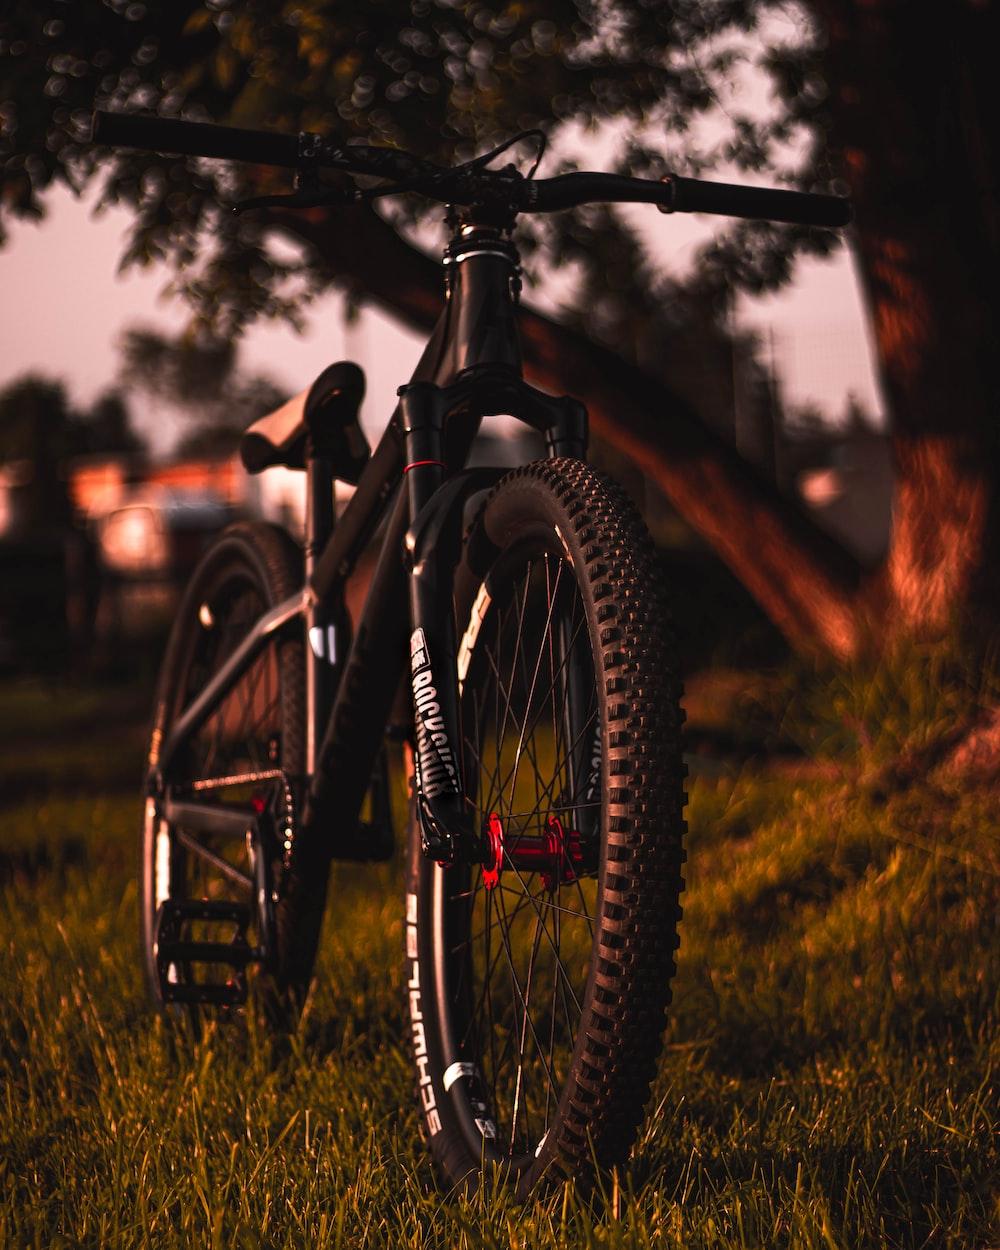 black hardtail bicycle on grassland